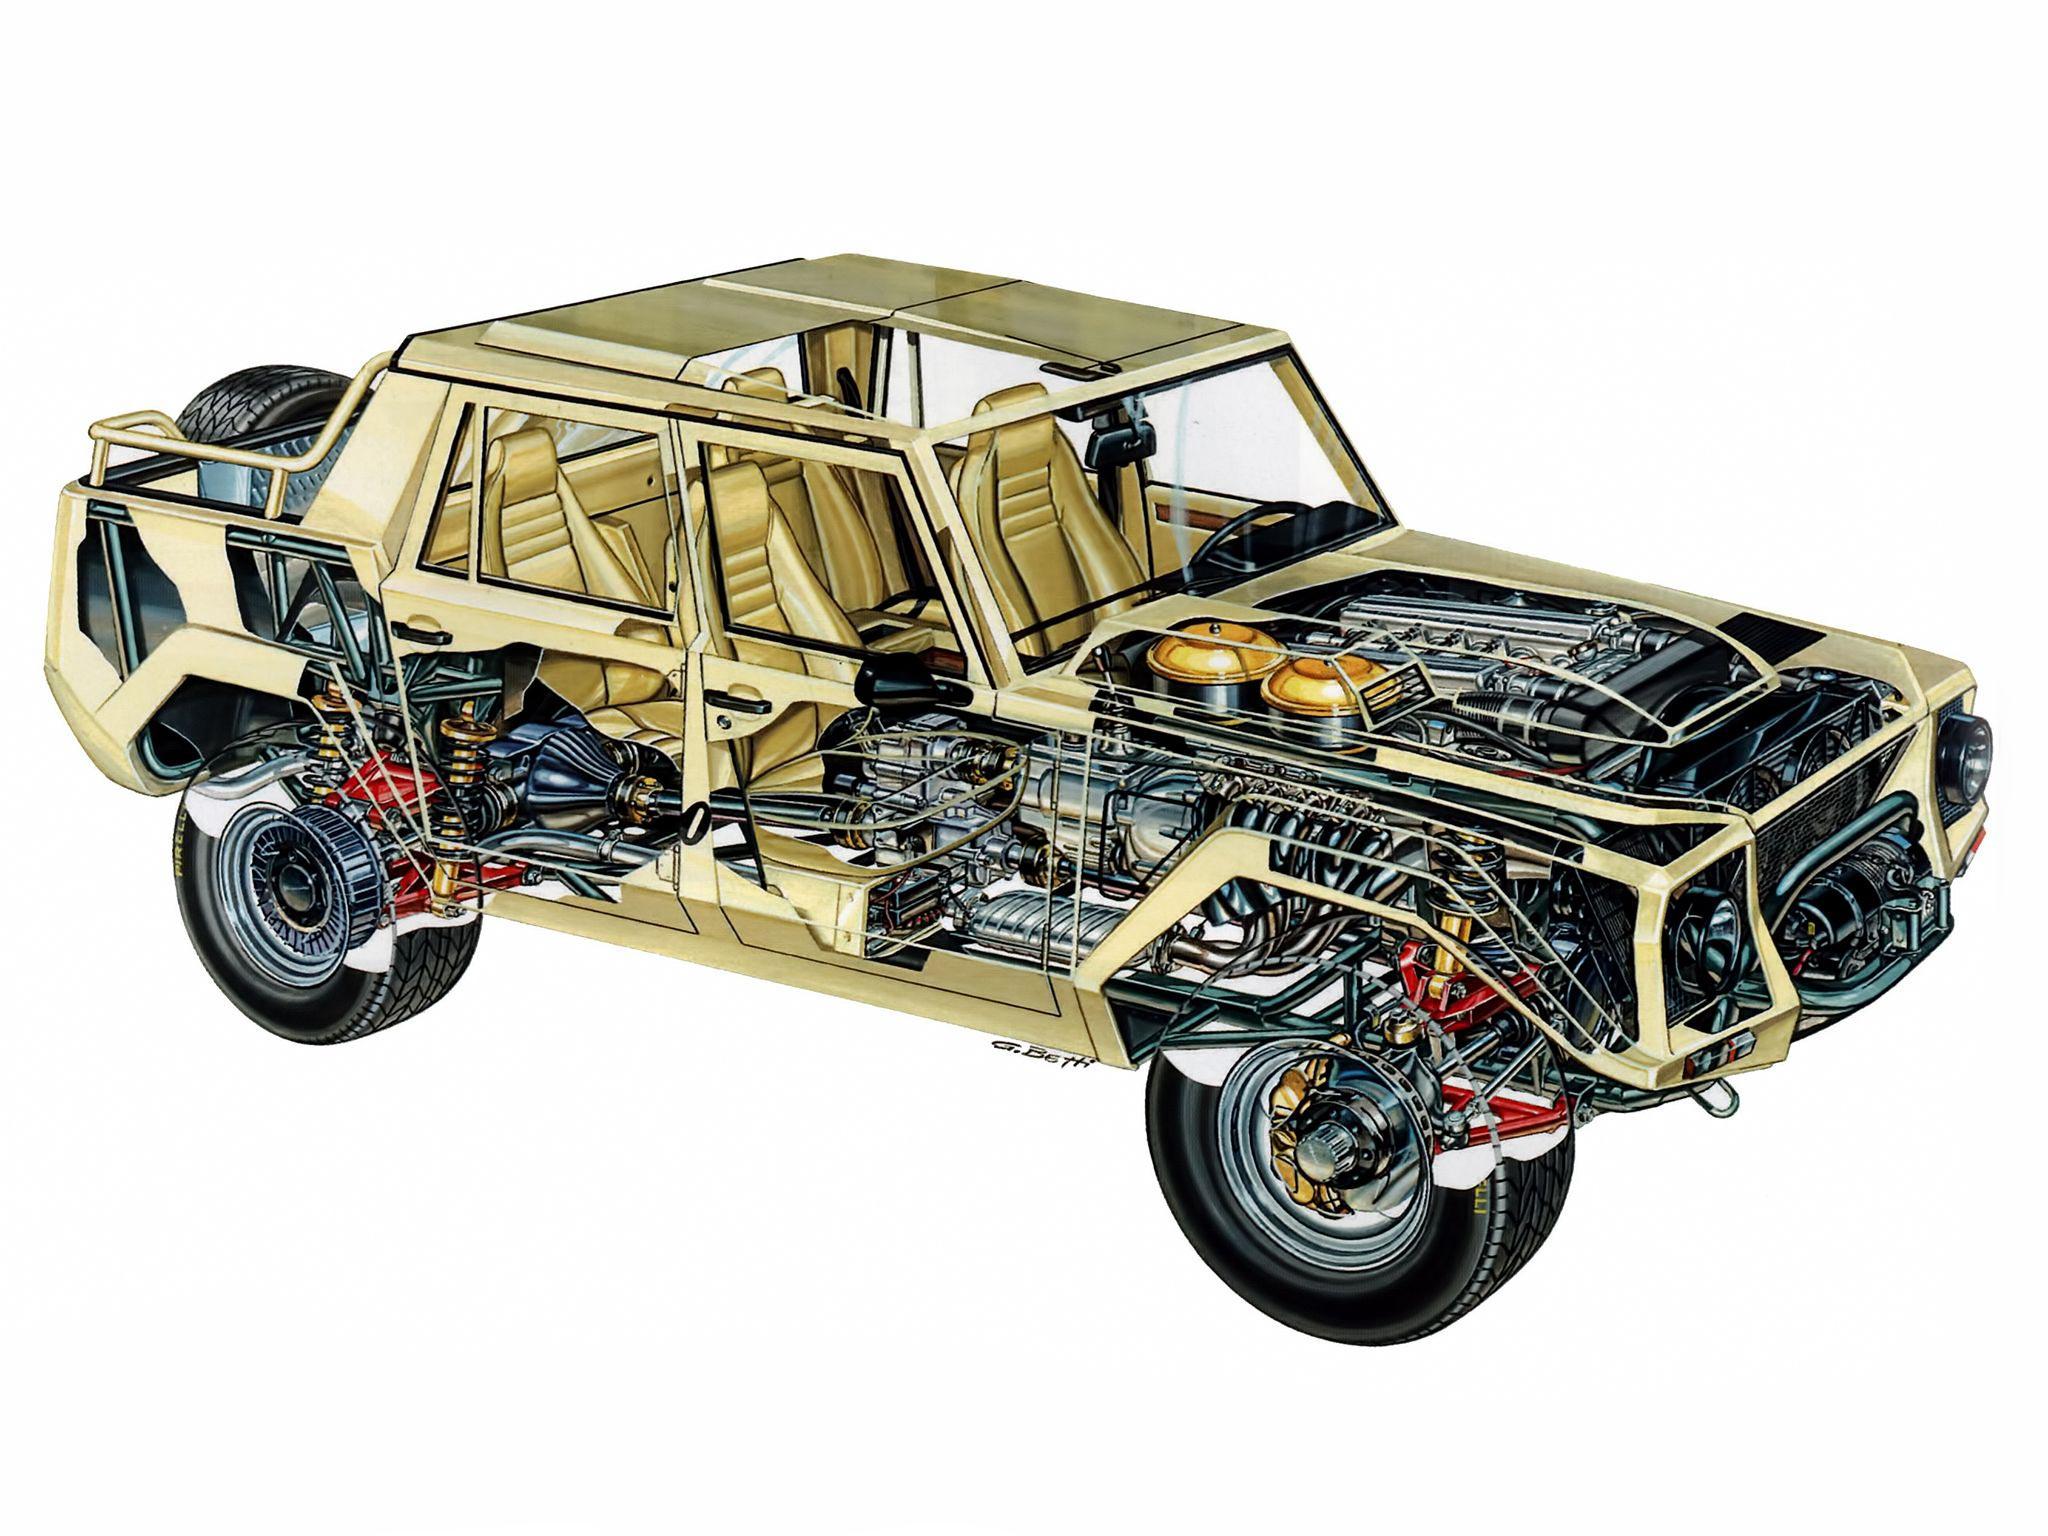 Lamborghini LM002 cutaway drawing